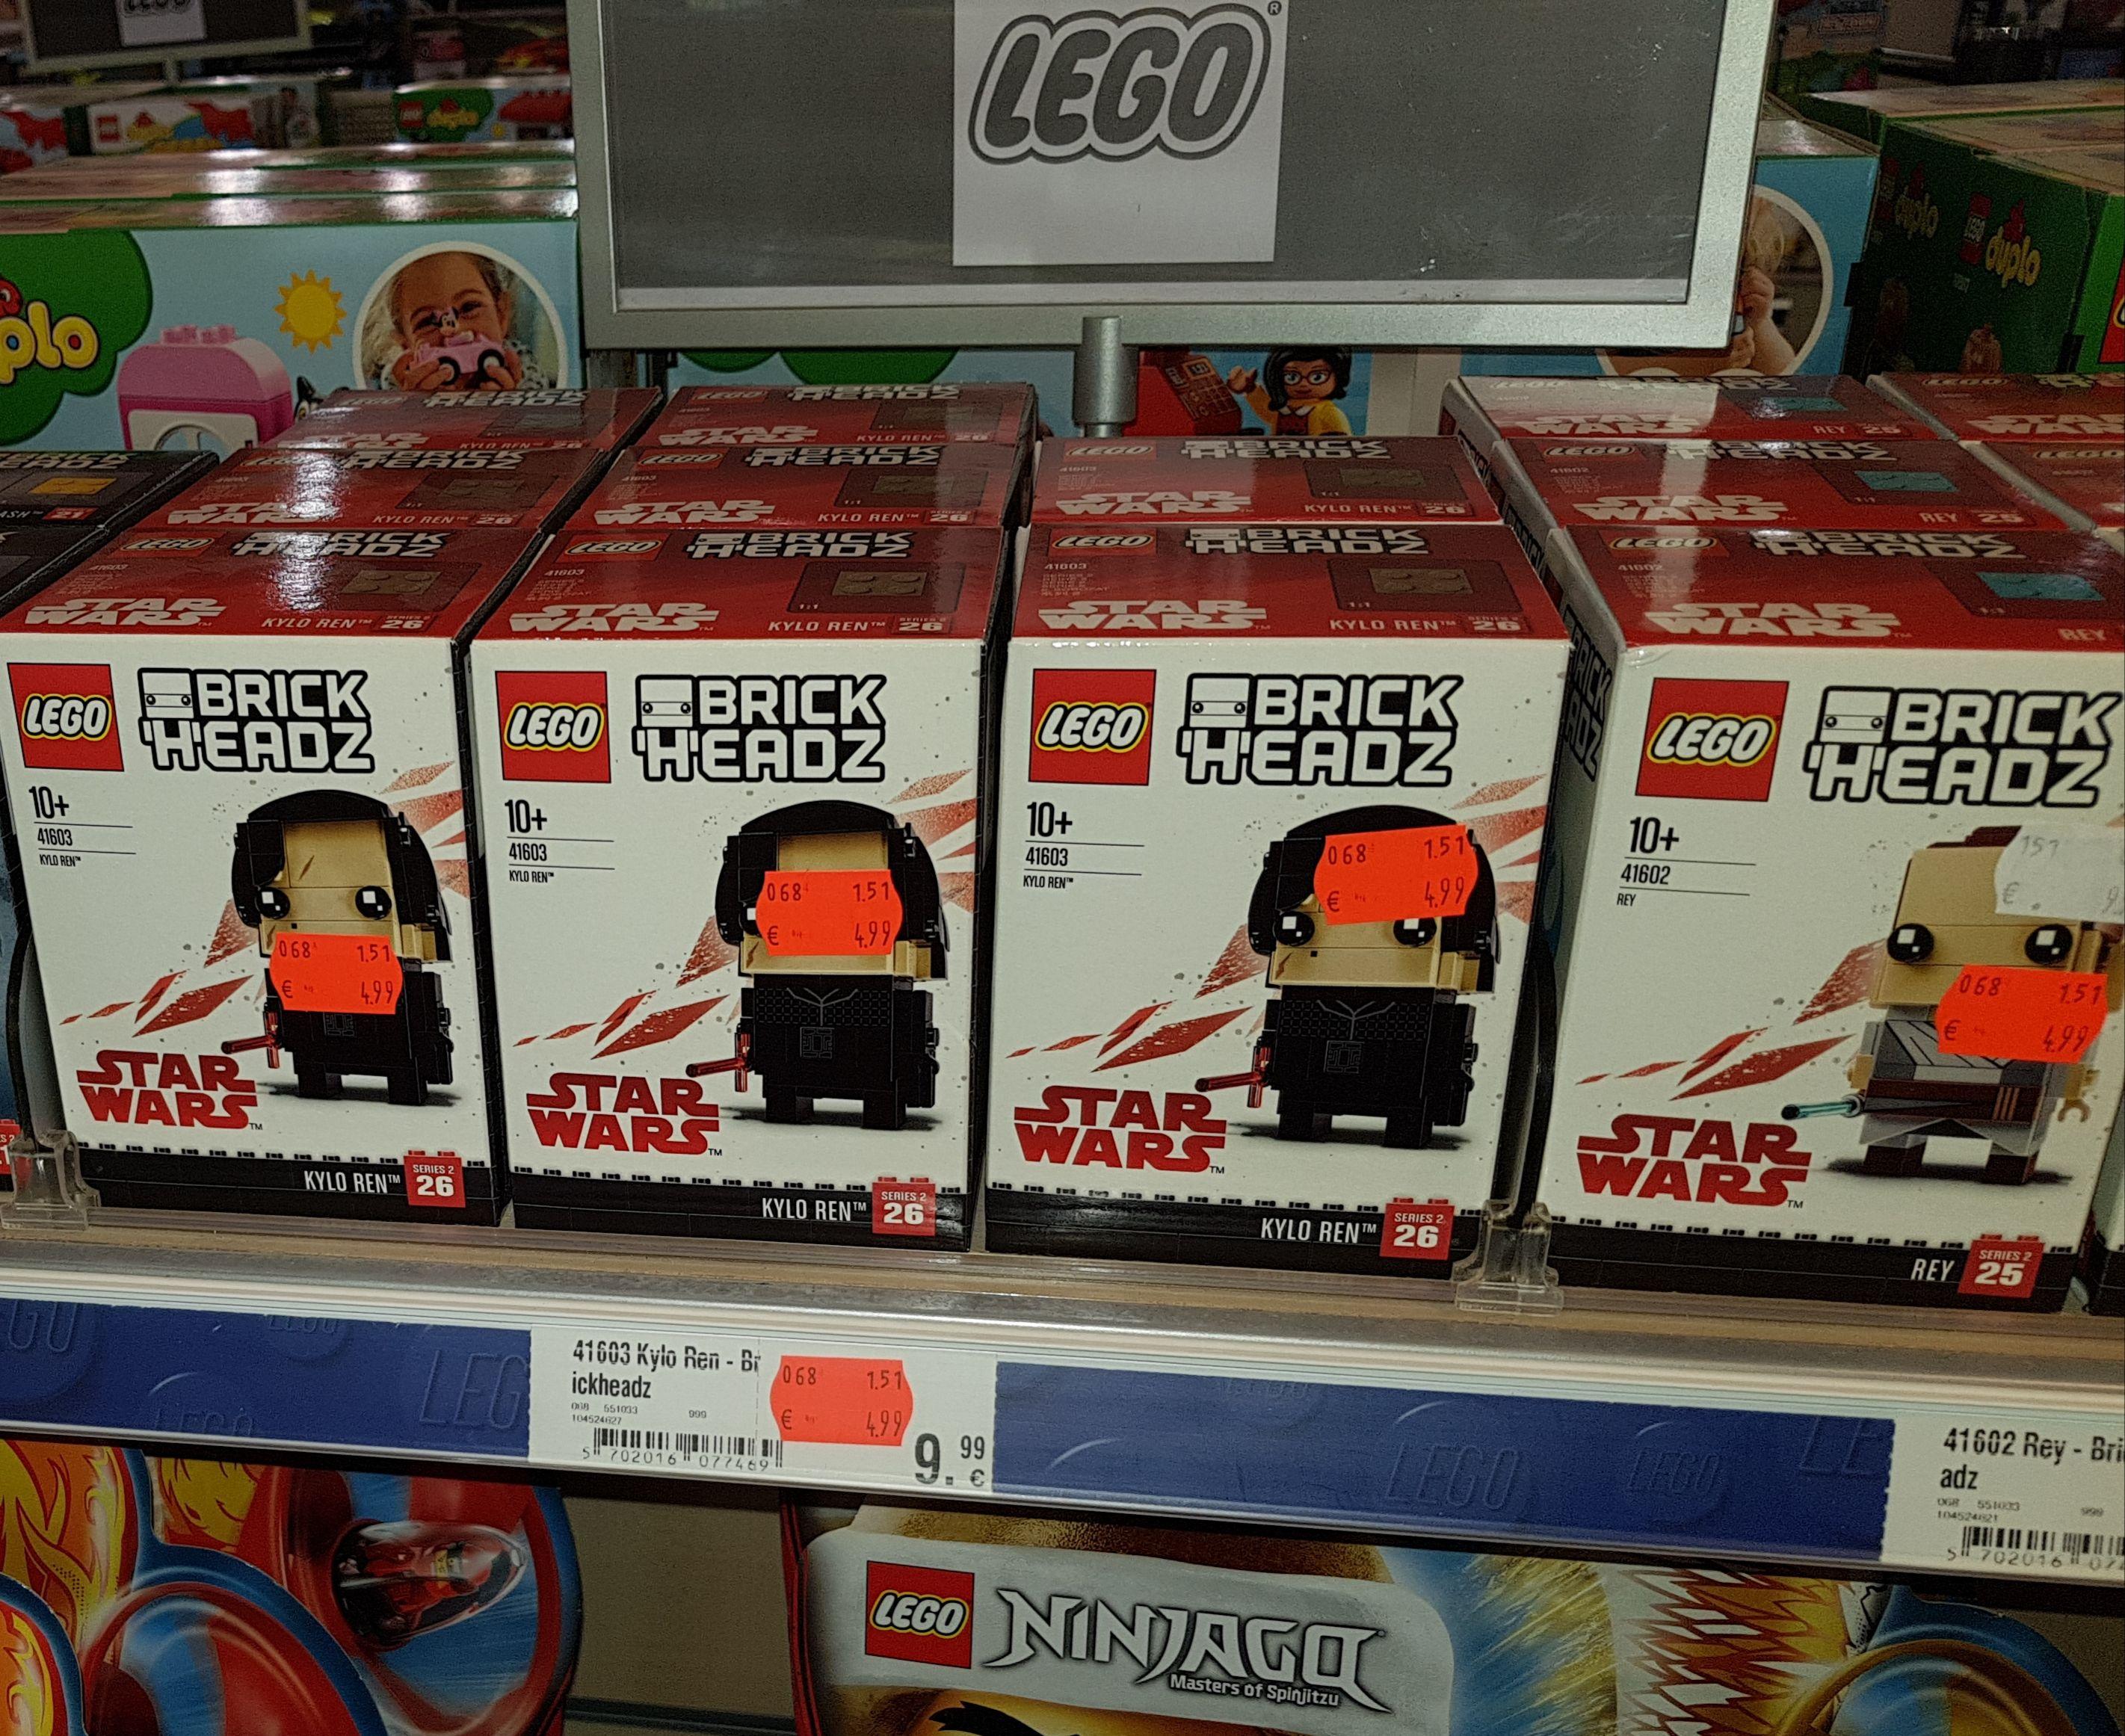 (Lokal) Karstadt Hannover Lego Brickheadz Rey 41062 +Keylo Ren 41063